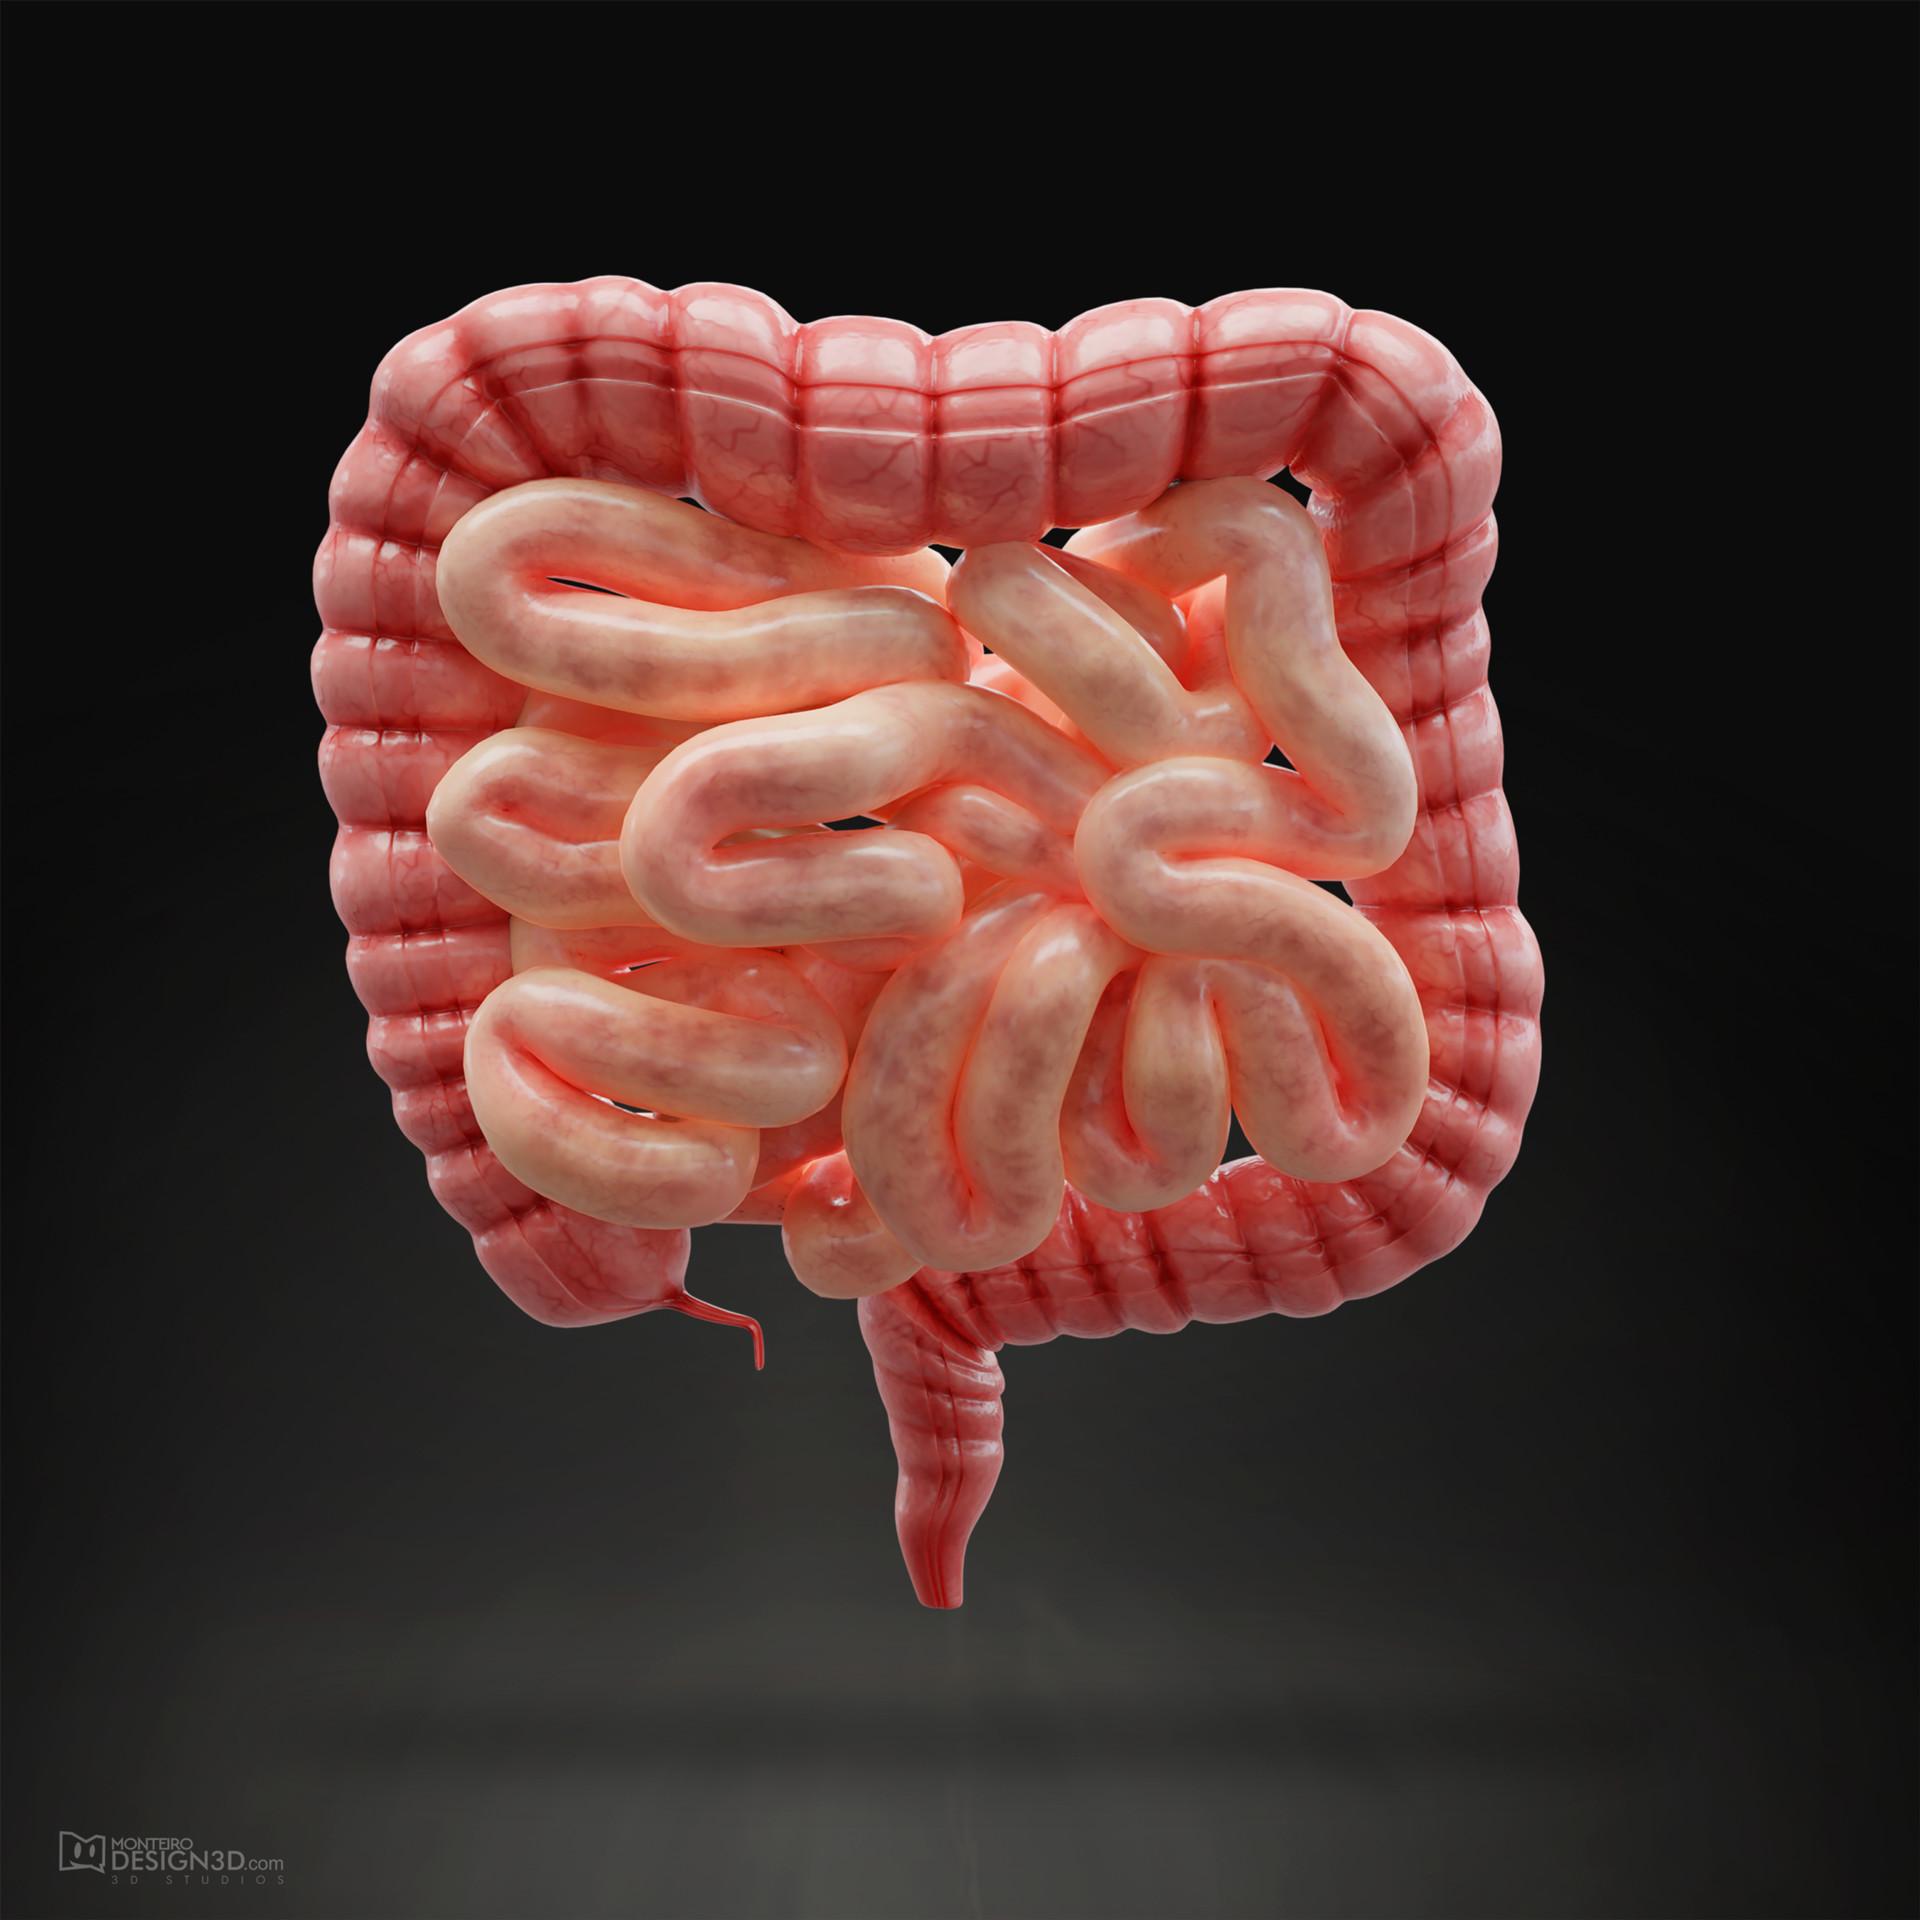 Alisson monteiro intestine 3d